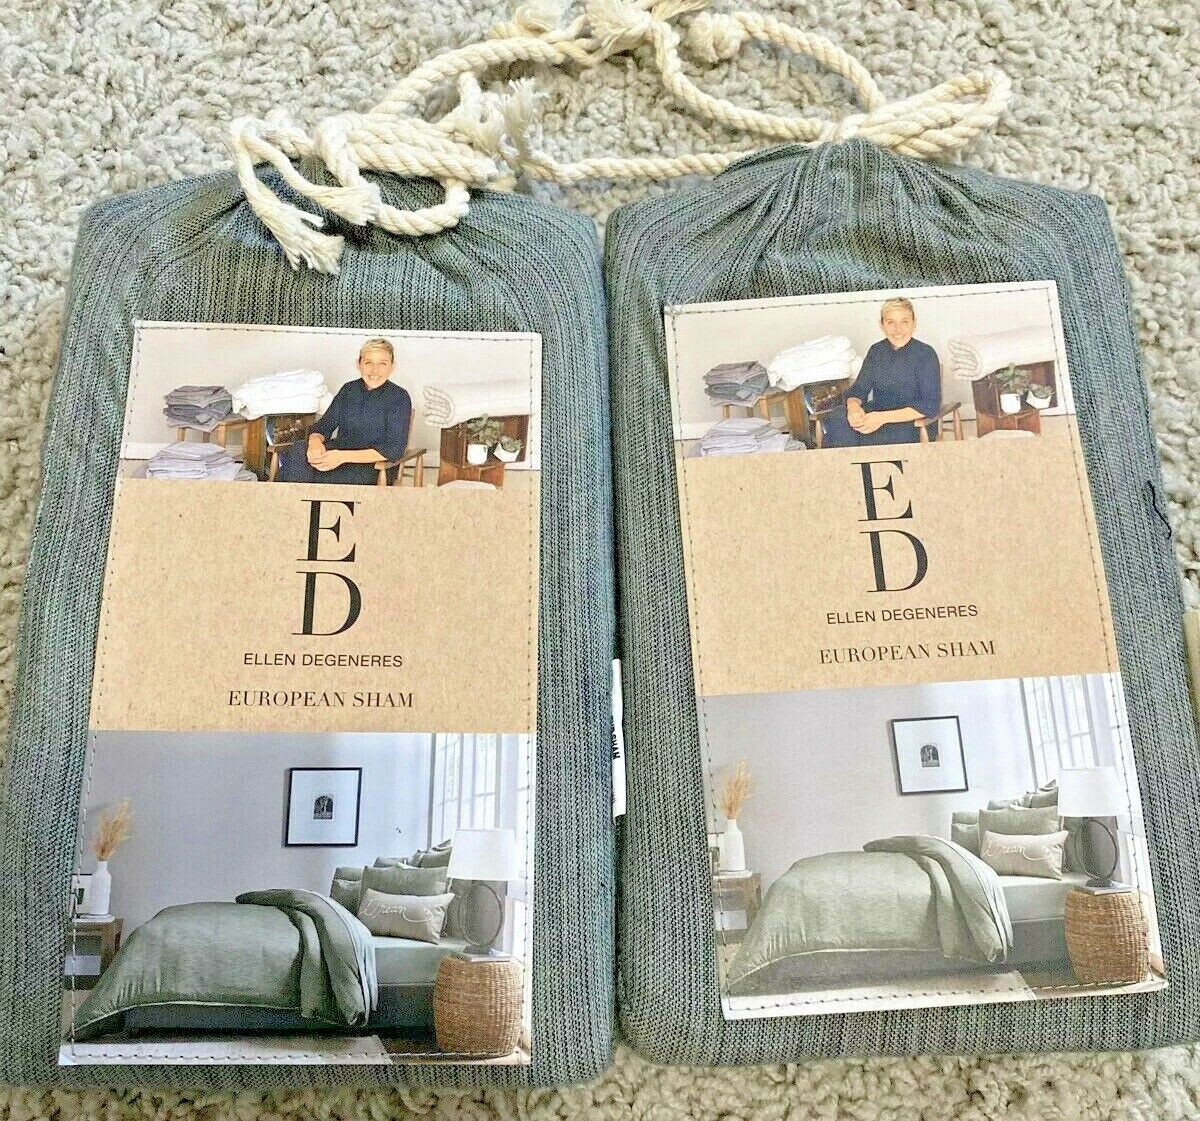 Ellen Degeneres Belmont Cotton Frayed Euro Sham Set of 2 Jade Green NIP Bedding